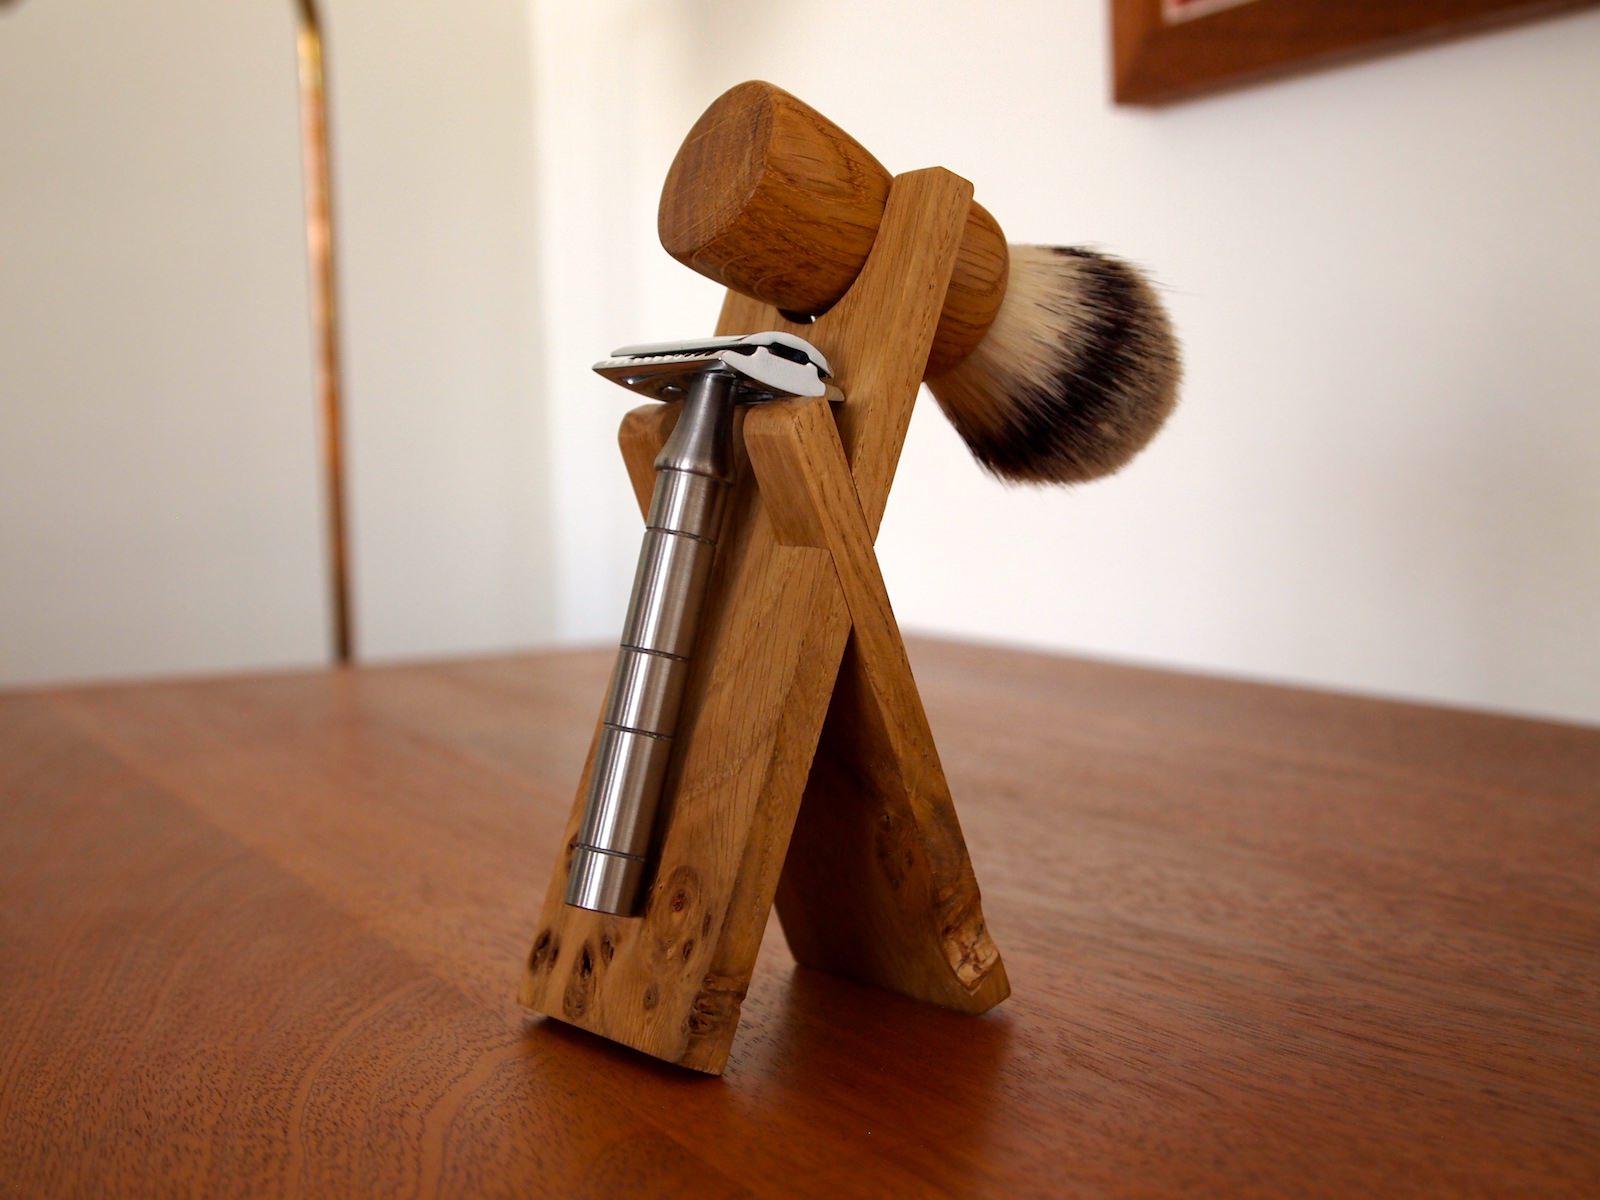 Stand anniversary shaving set desk razor 2.JPG